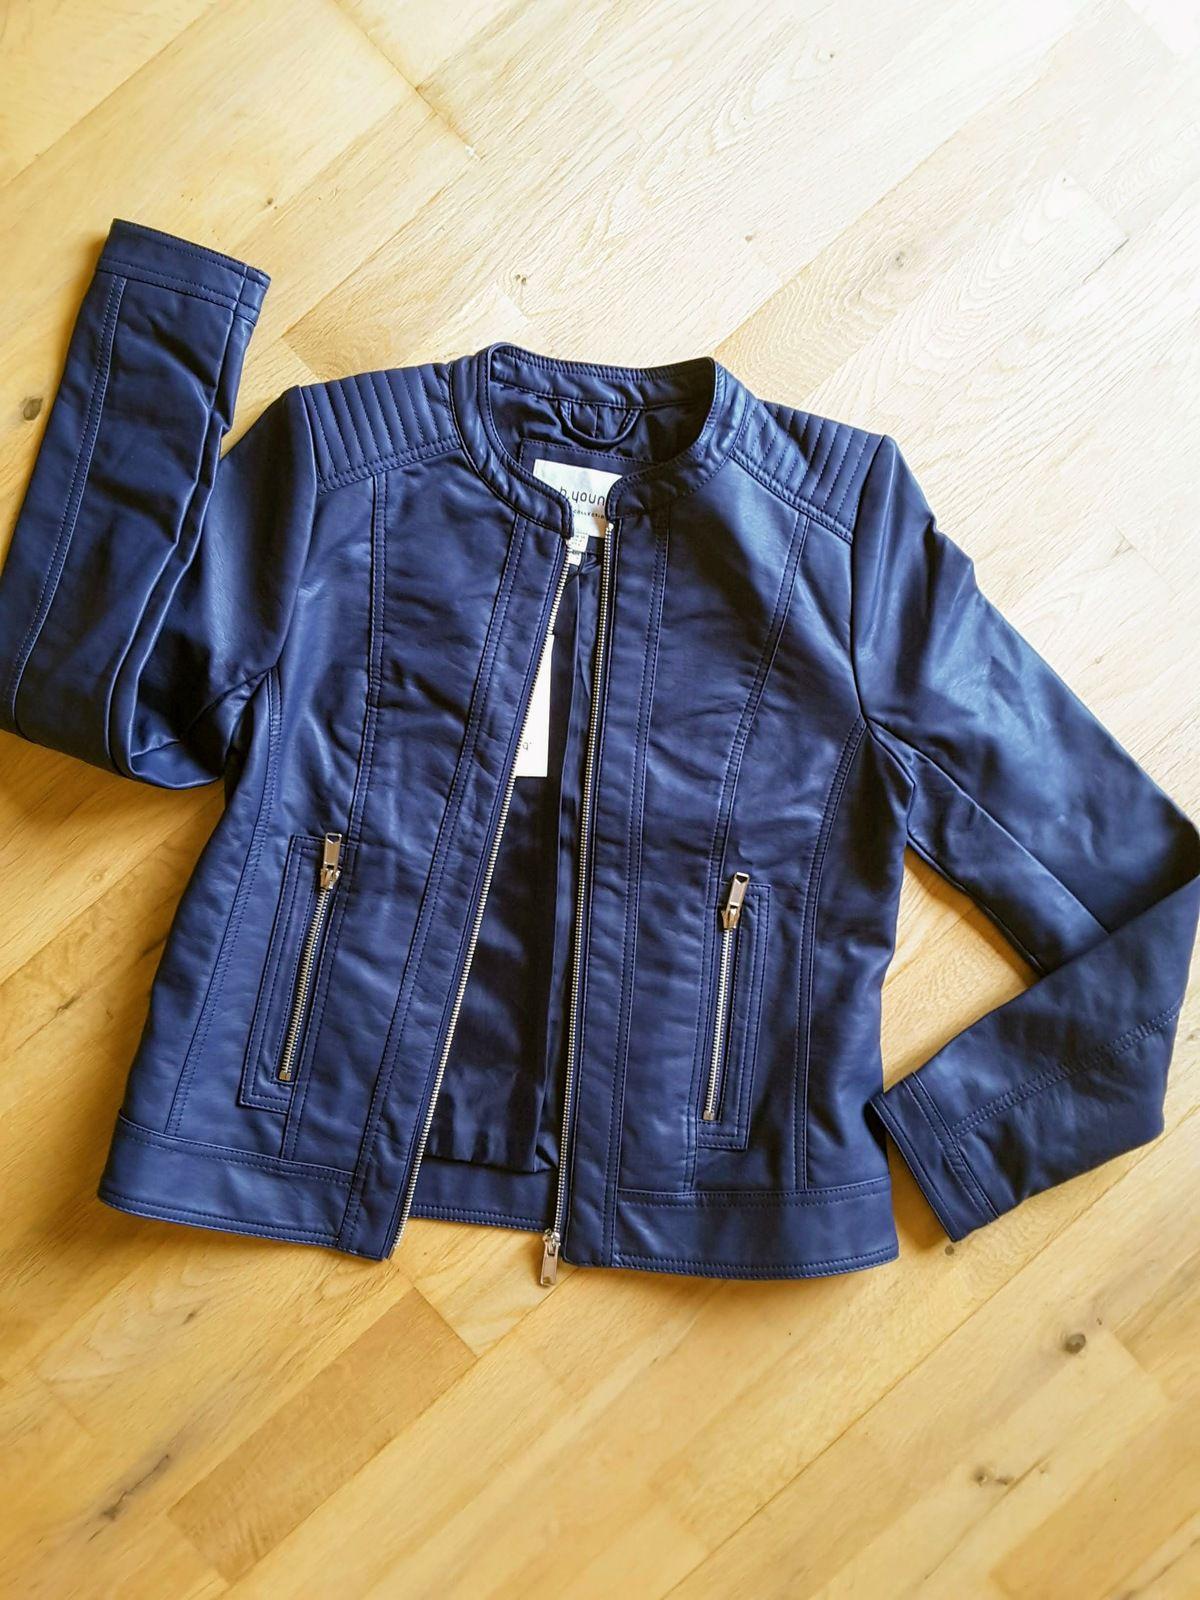 veste Acom Jacket Port blue dark - B.Young lookiero missbonsplansdunet personal shopper box vêtement